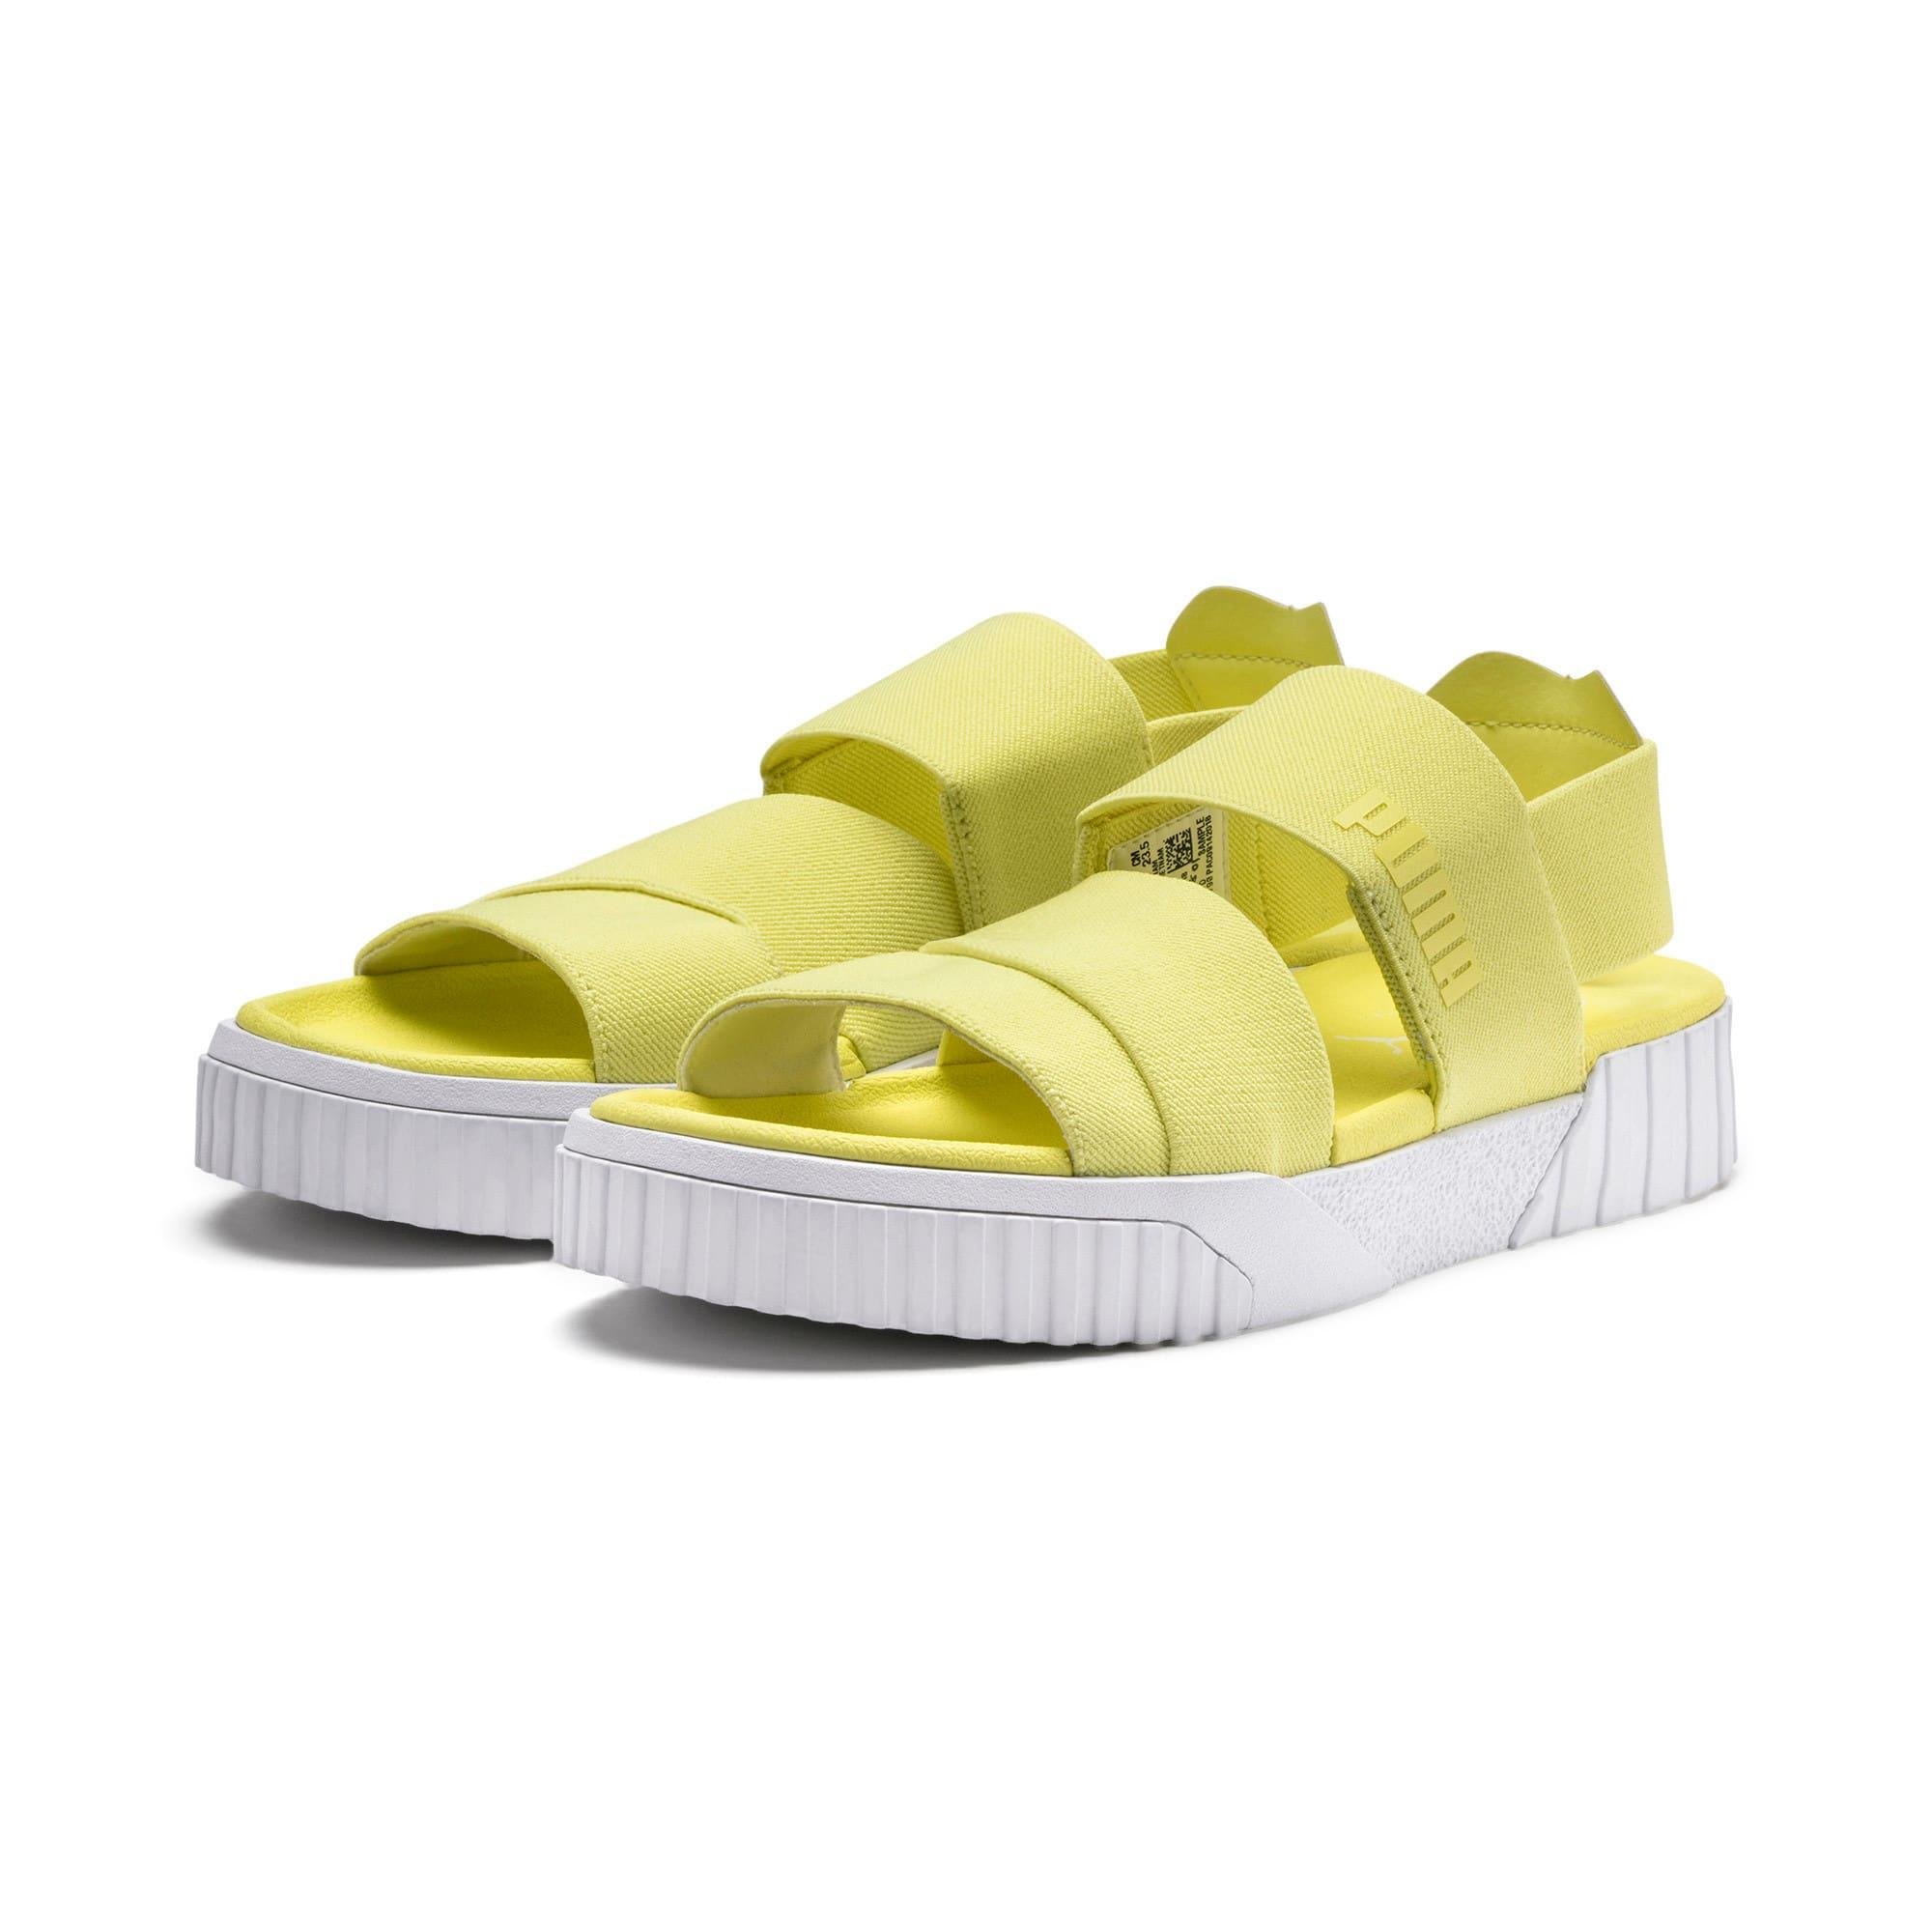 Thumbnail 3 of PUMA x SELENA GOMEZ Cali Women's Sandals, SOFT FLUO YELLOW, medium